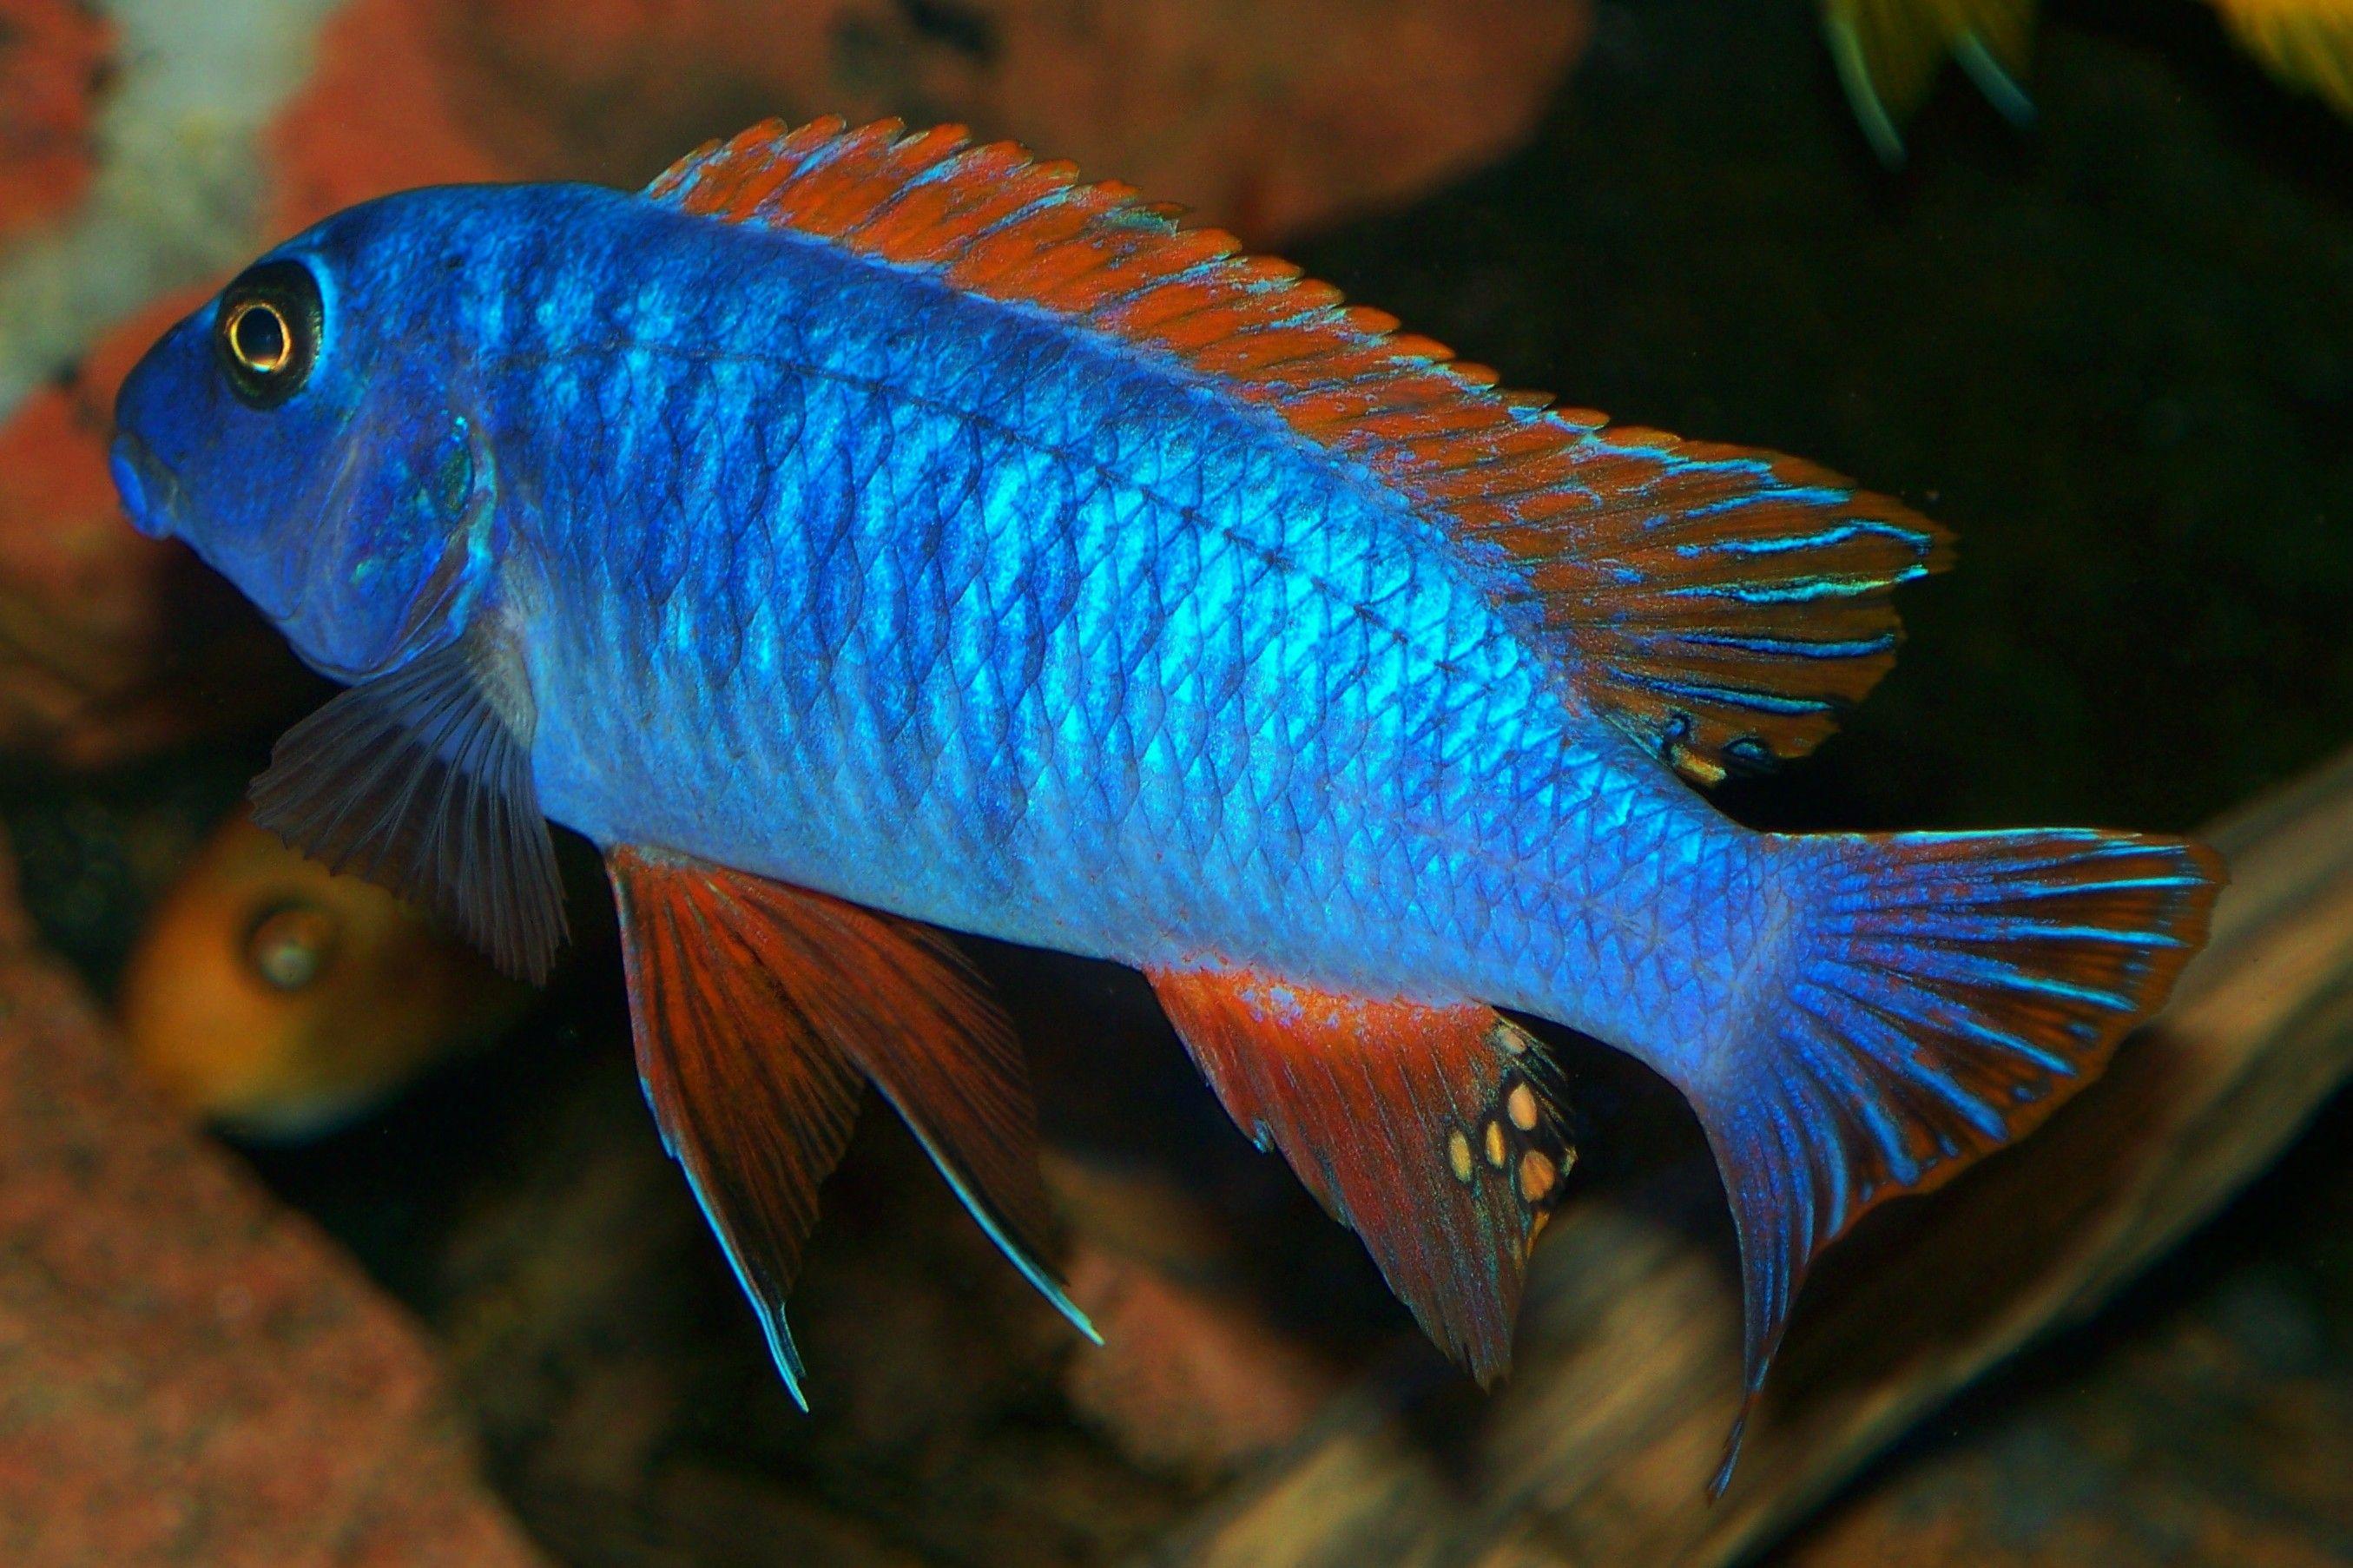 Red Top Trewavasae Cichlid African Cichlids Cichlids African Cichlid Aquarium